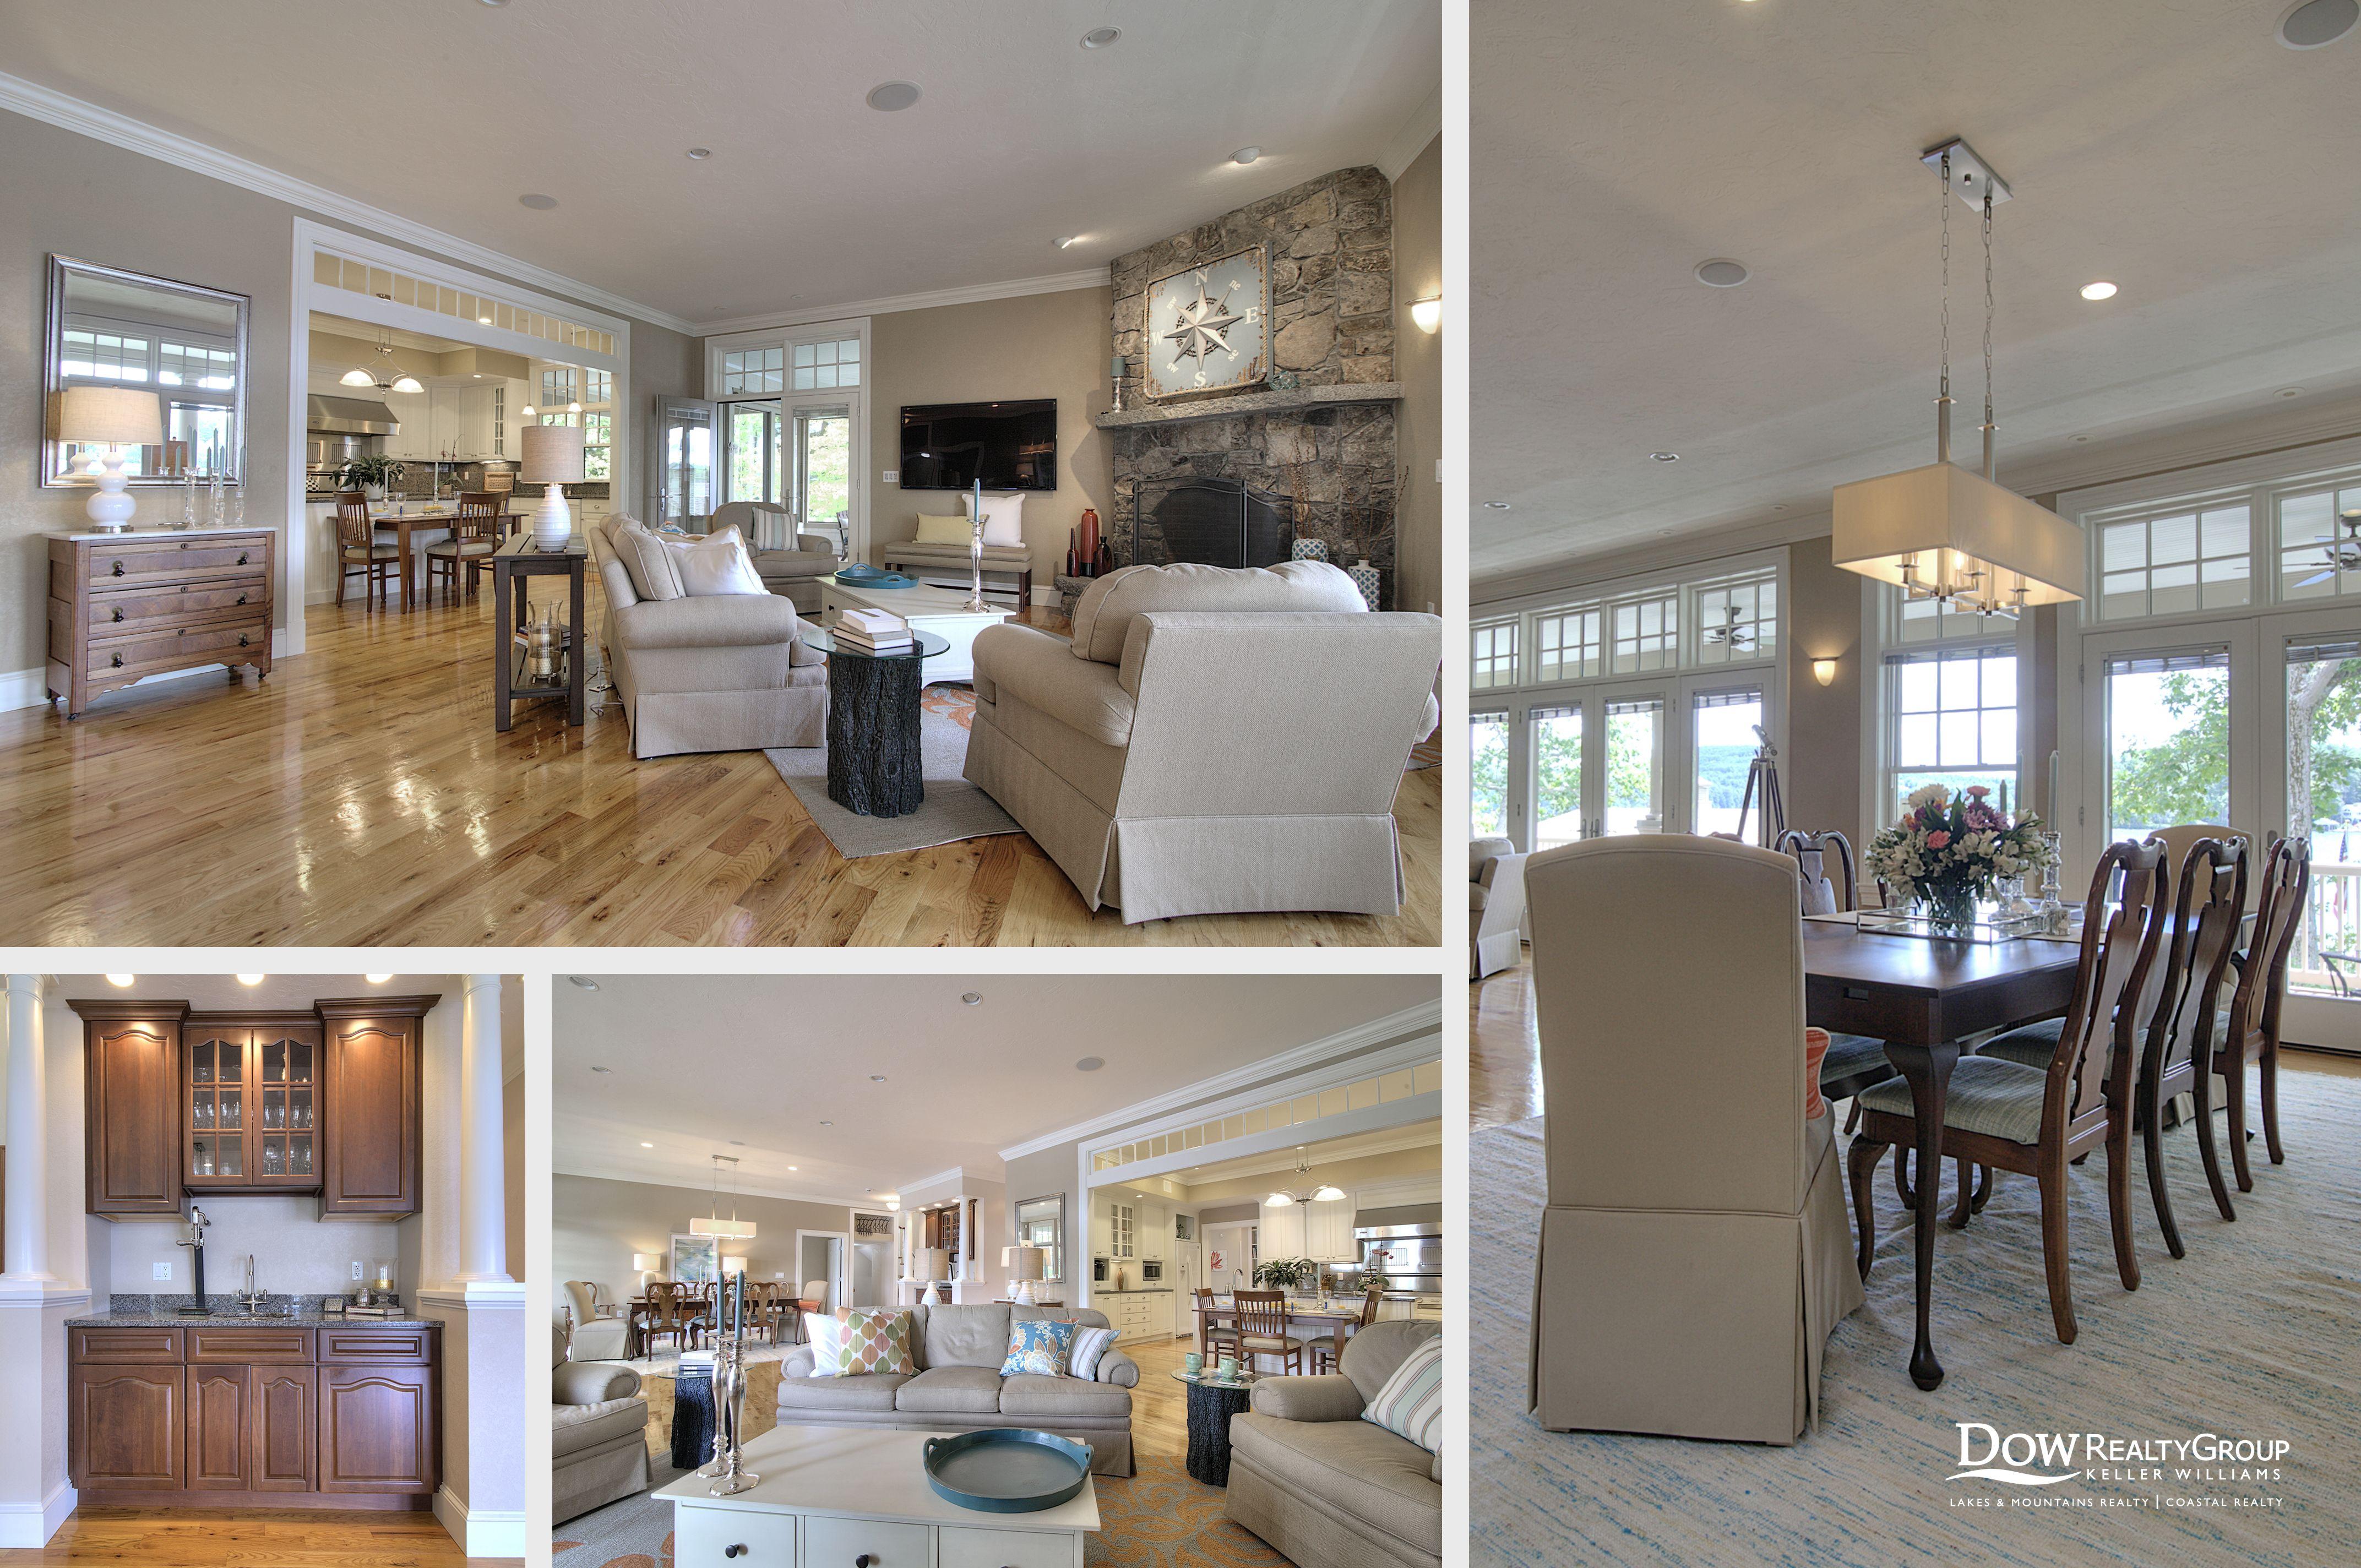 179 kingswood road wolfeboro nh 03894 open concept floor